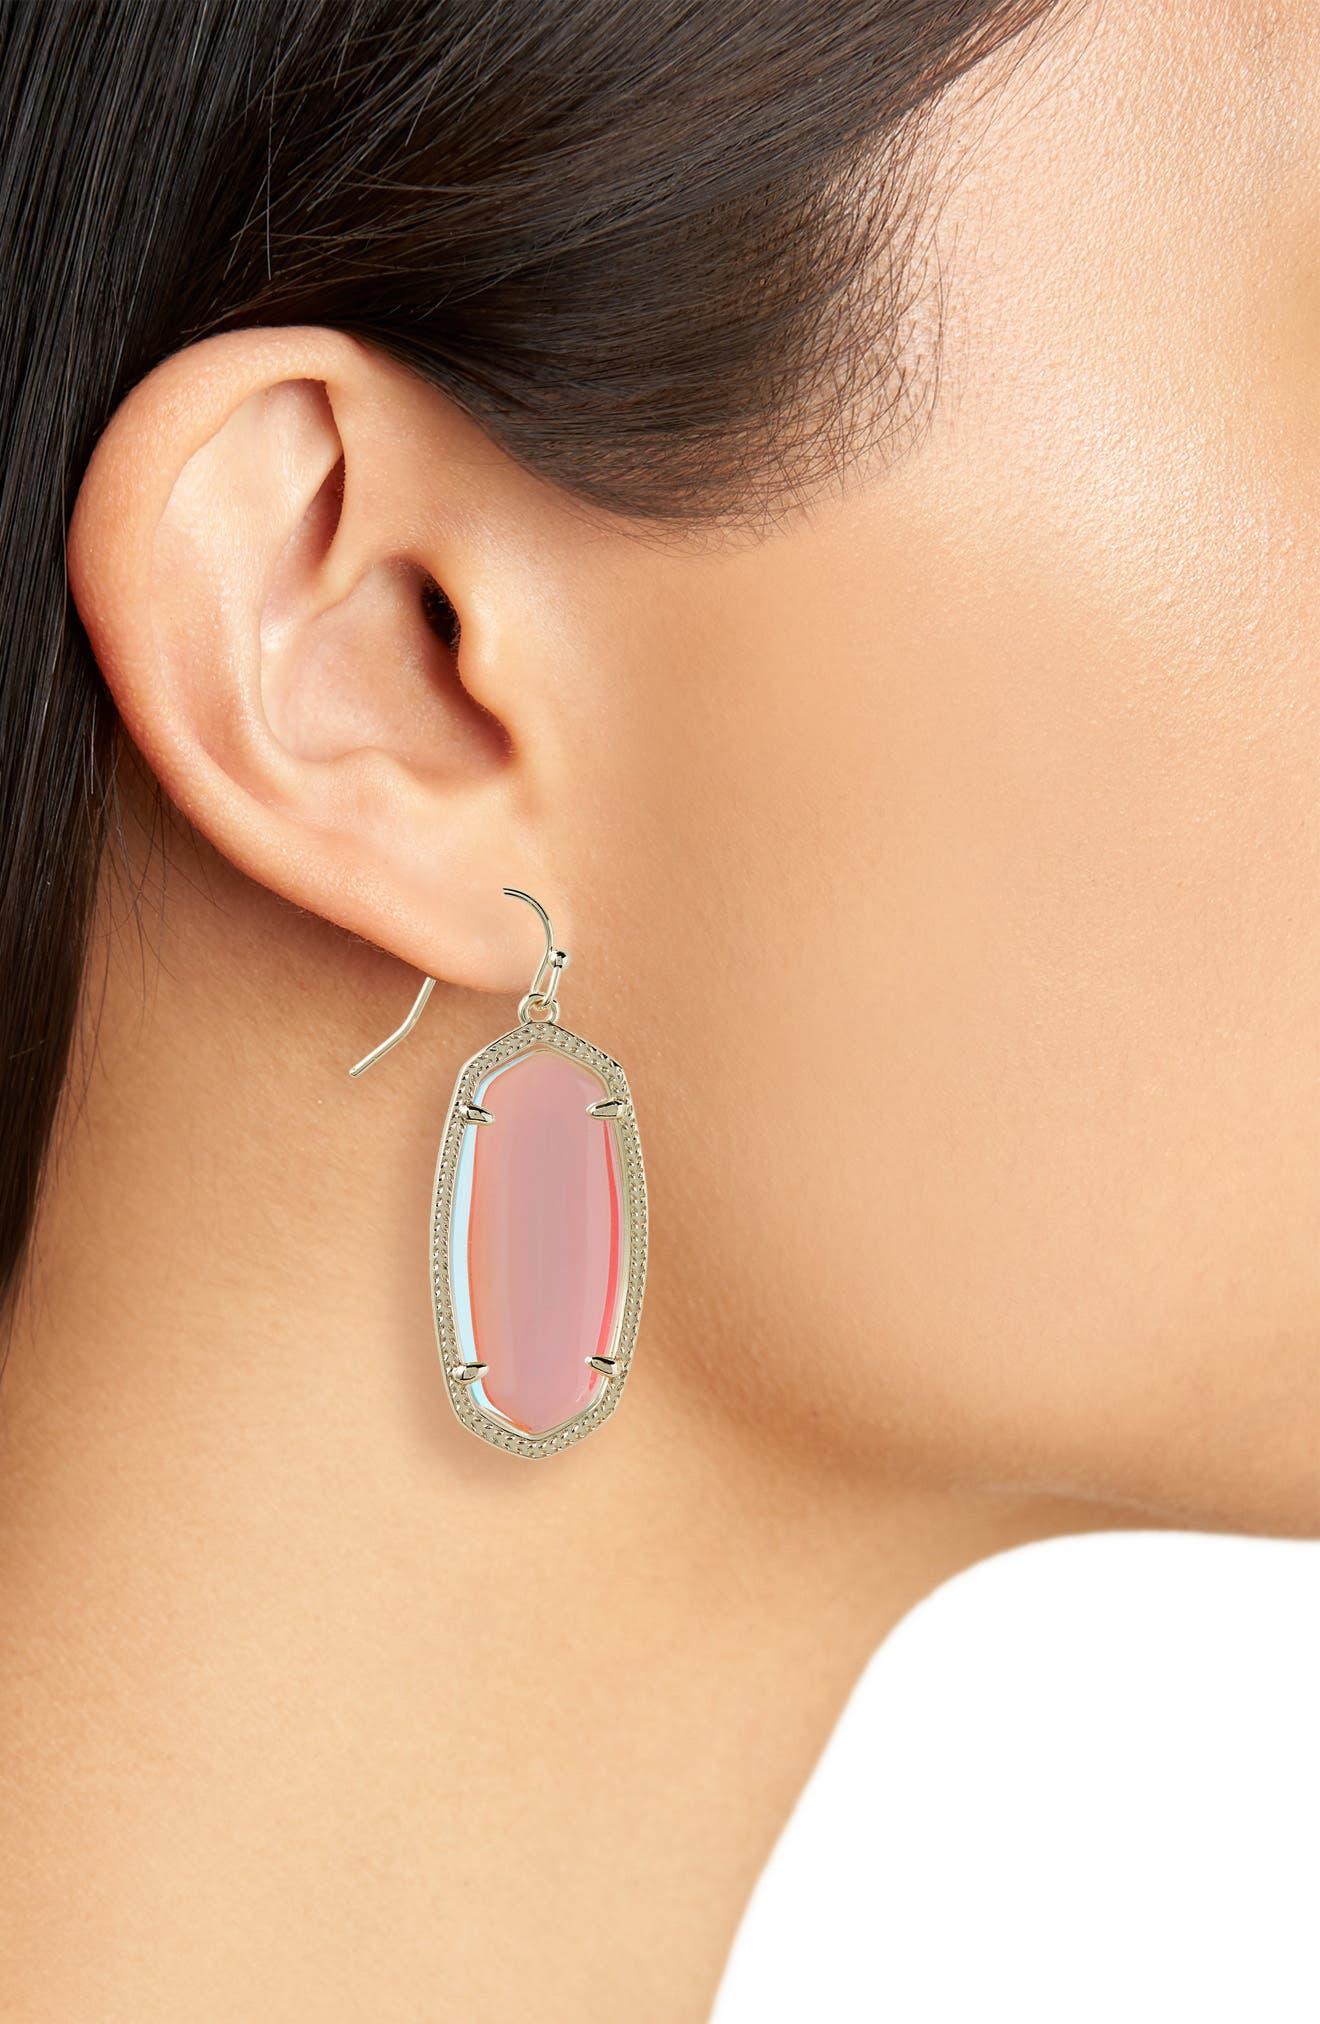 Elle Drop Earrings,                             Alternate thumbnail 2, color,                             Dichroic Glass/ Gold